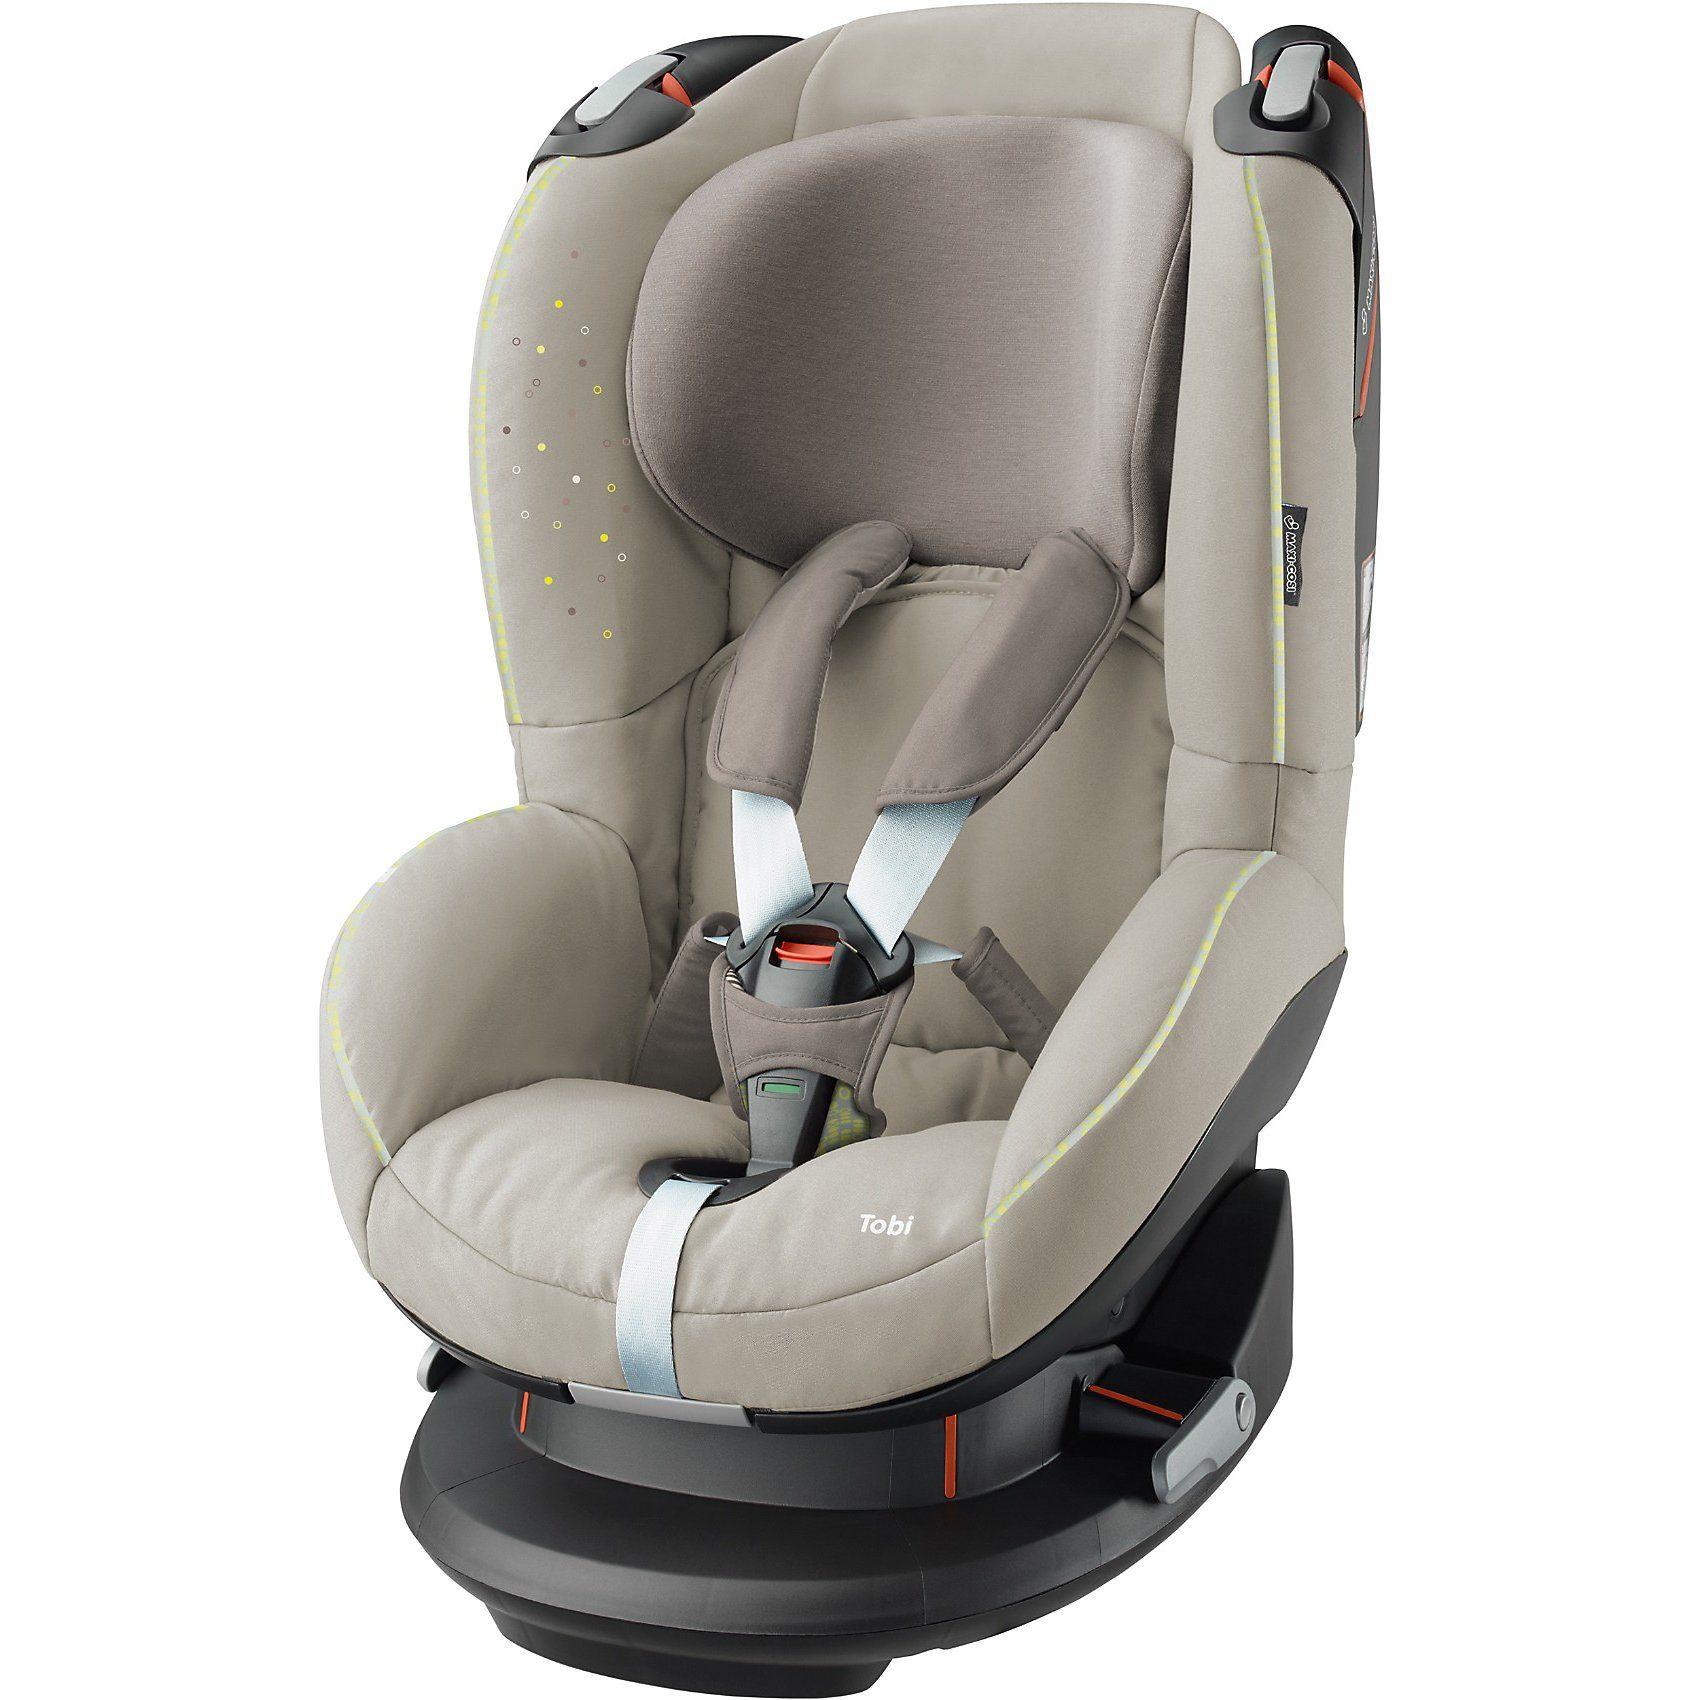 Maxi-Cosi Auto-Kindersitz Tobi, Digital Rain, 2015